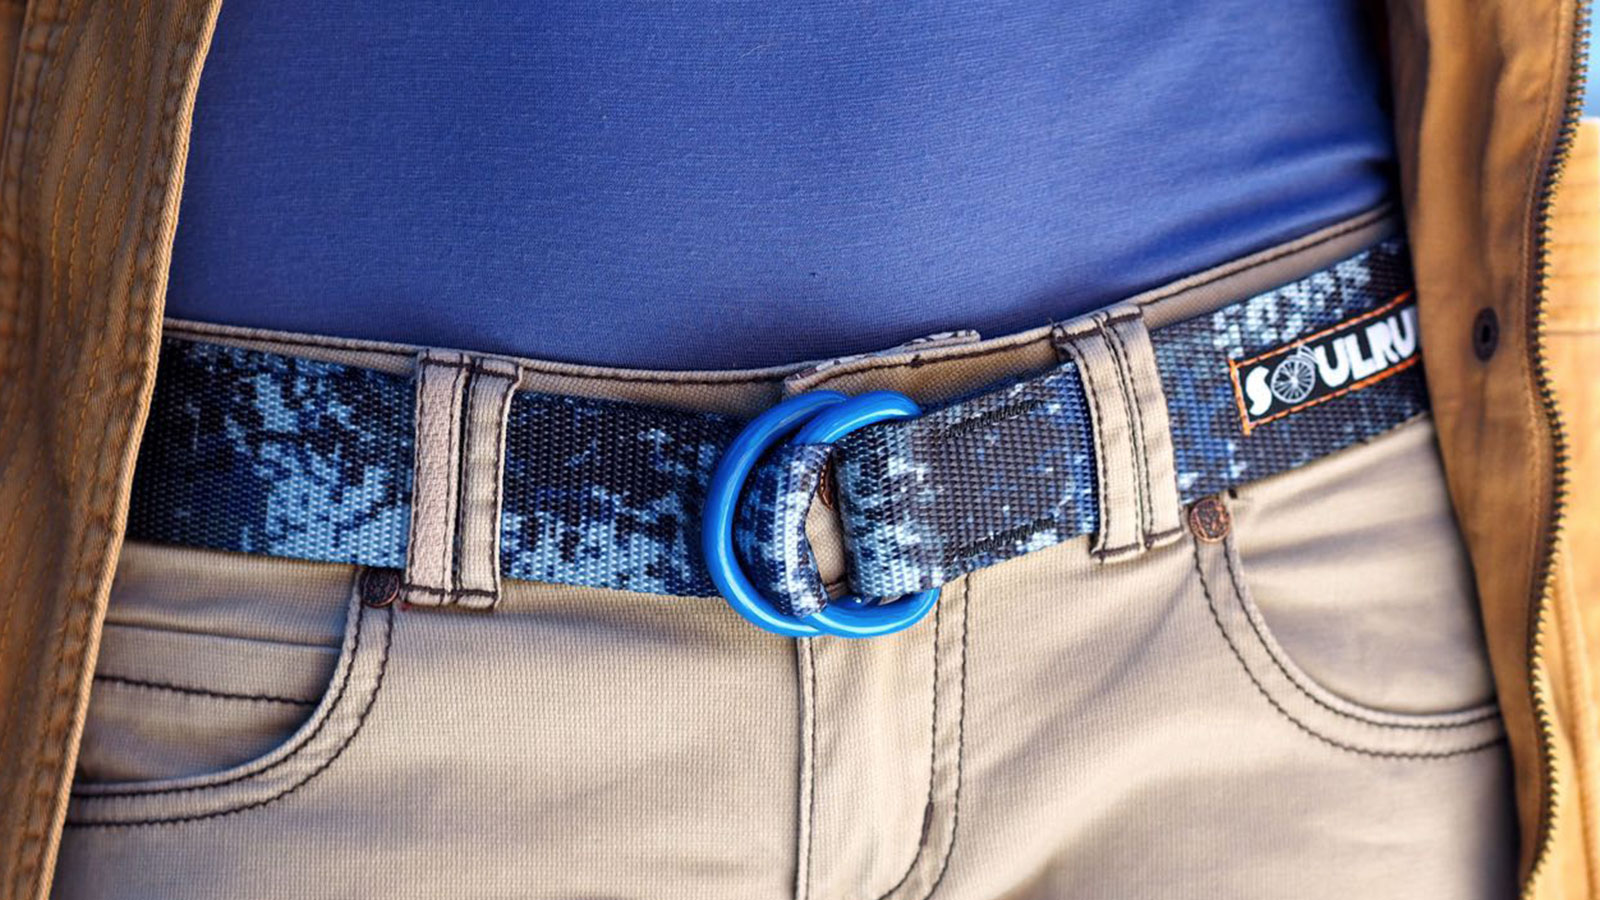 Soulrun Belts